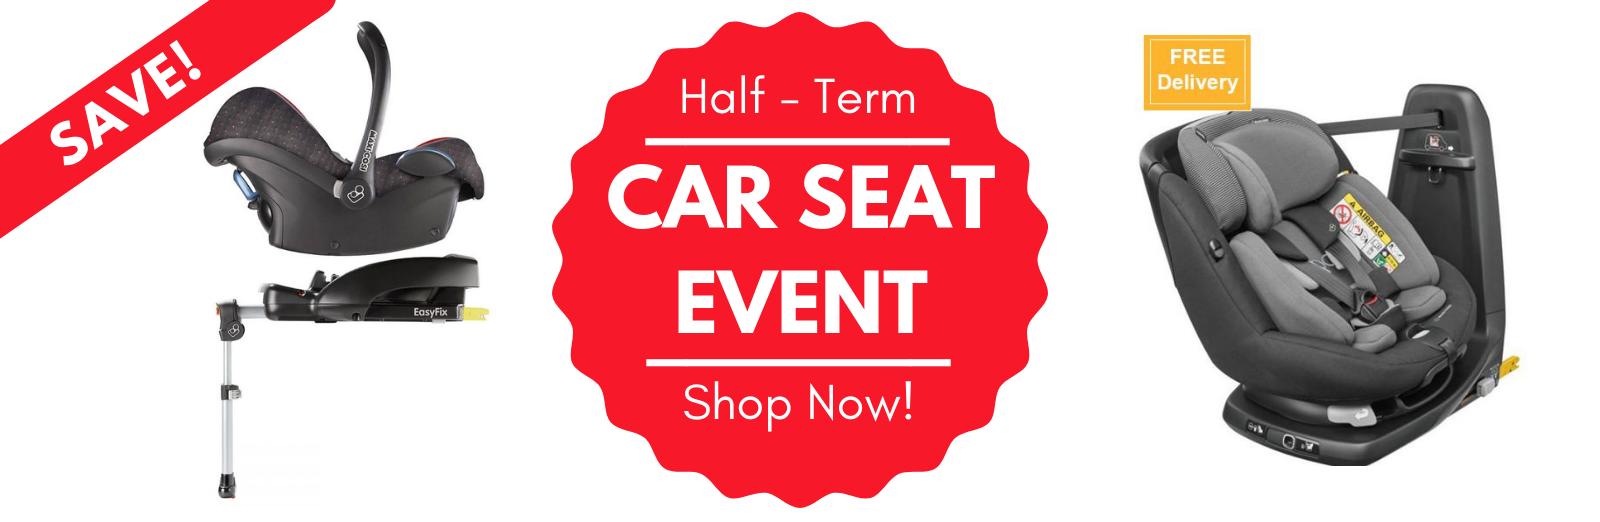 Car Seat Event